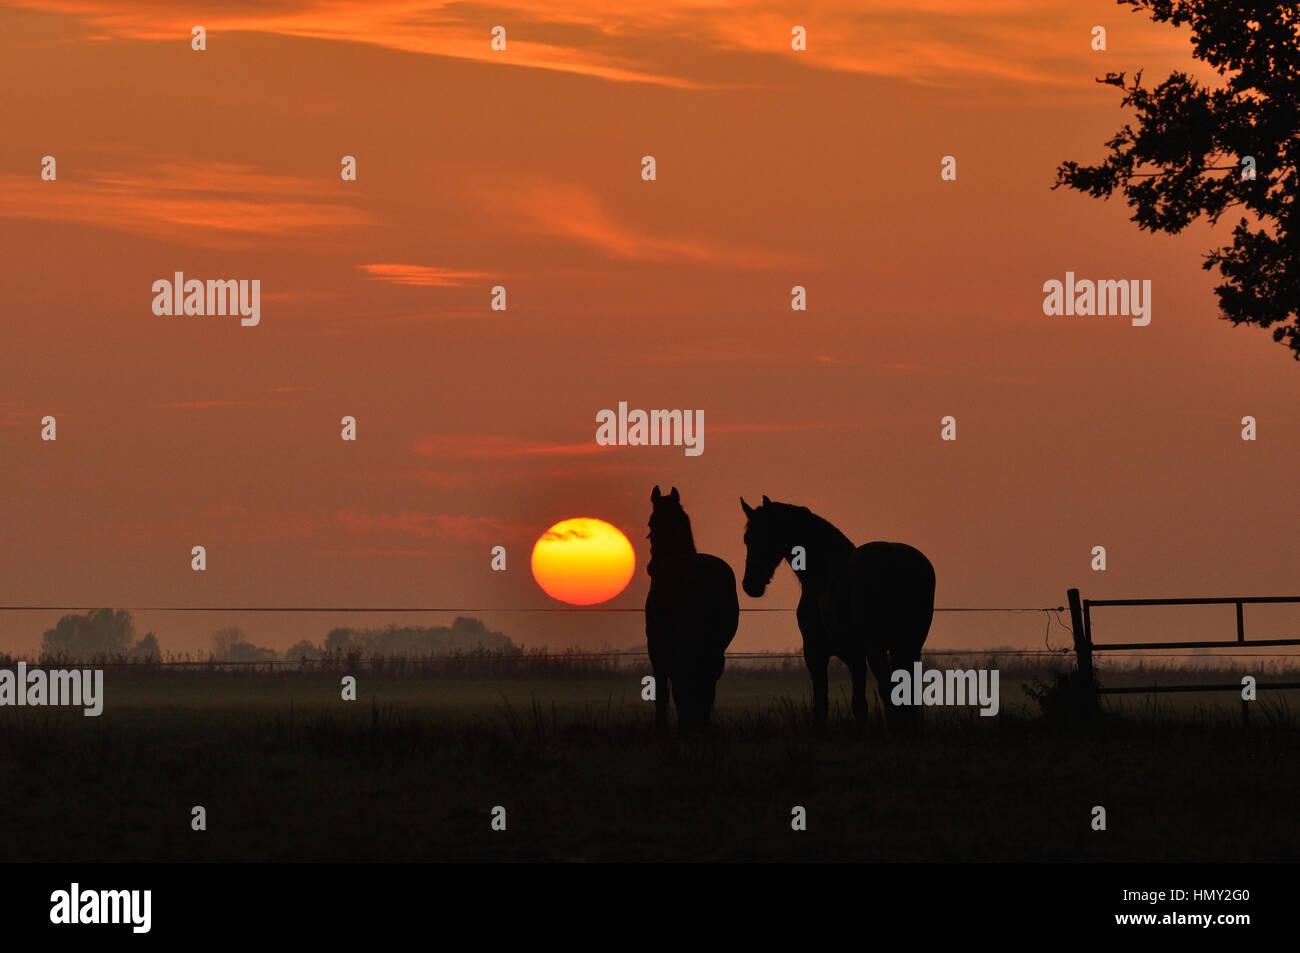 Zwei Pferde in einem Feld bei Sonnenuntergang Stockbild